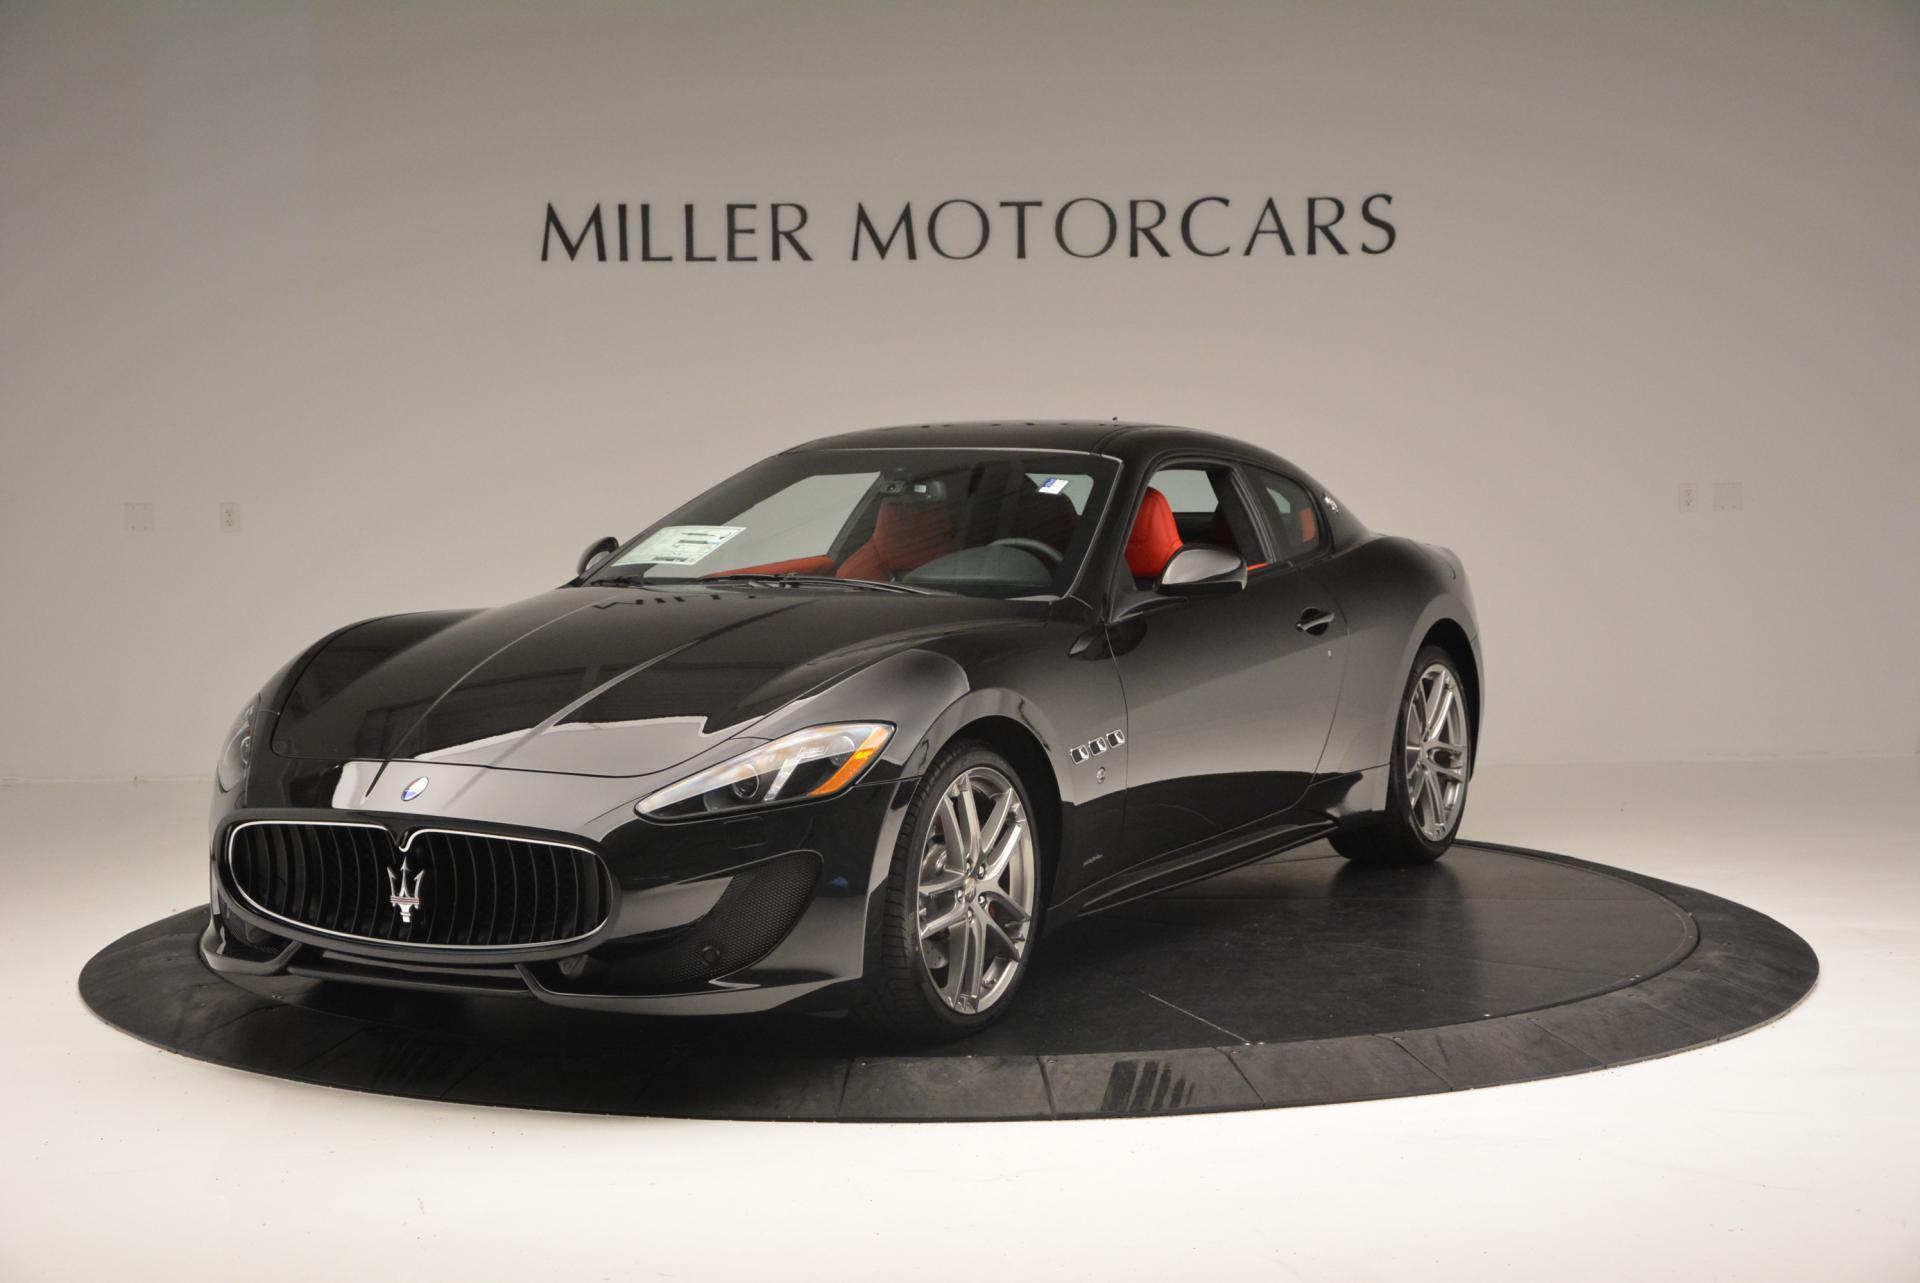 New 2016 Maserati GranTurismo Sport for sale Sold at Maserati of Westport in Westport CT 06880 1